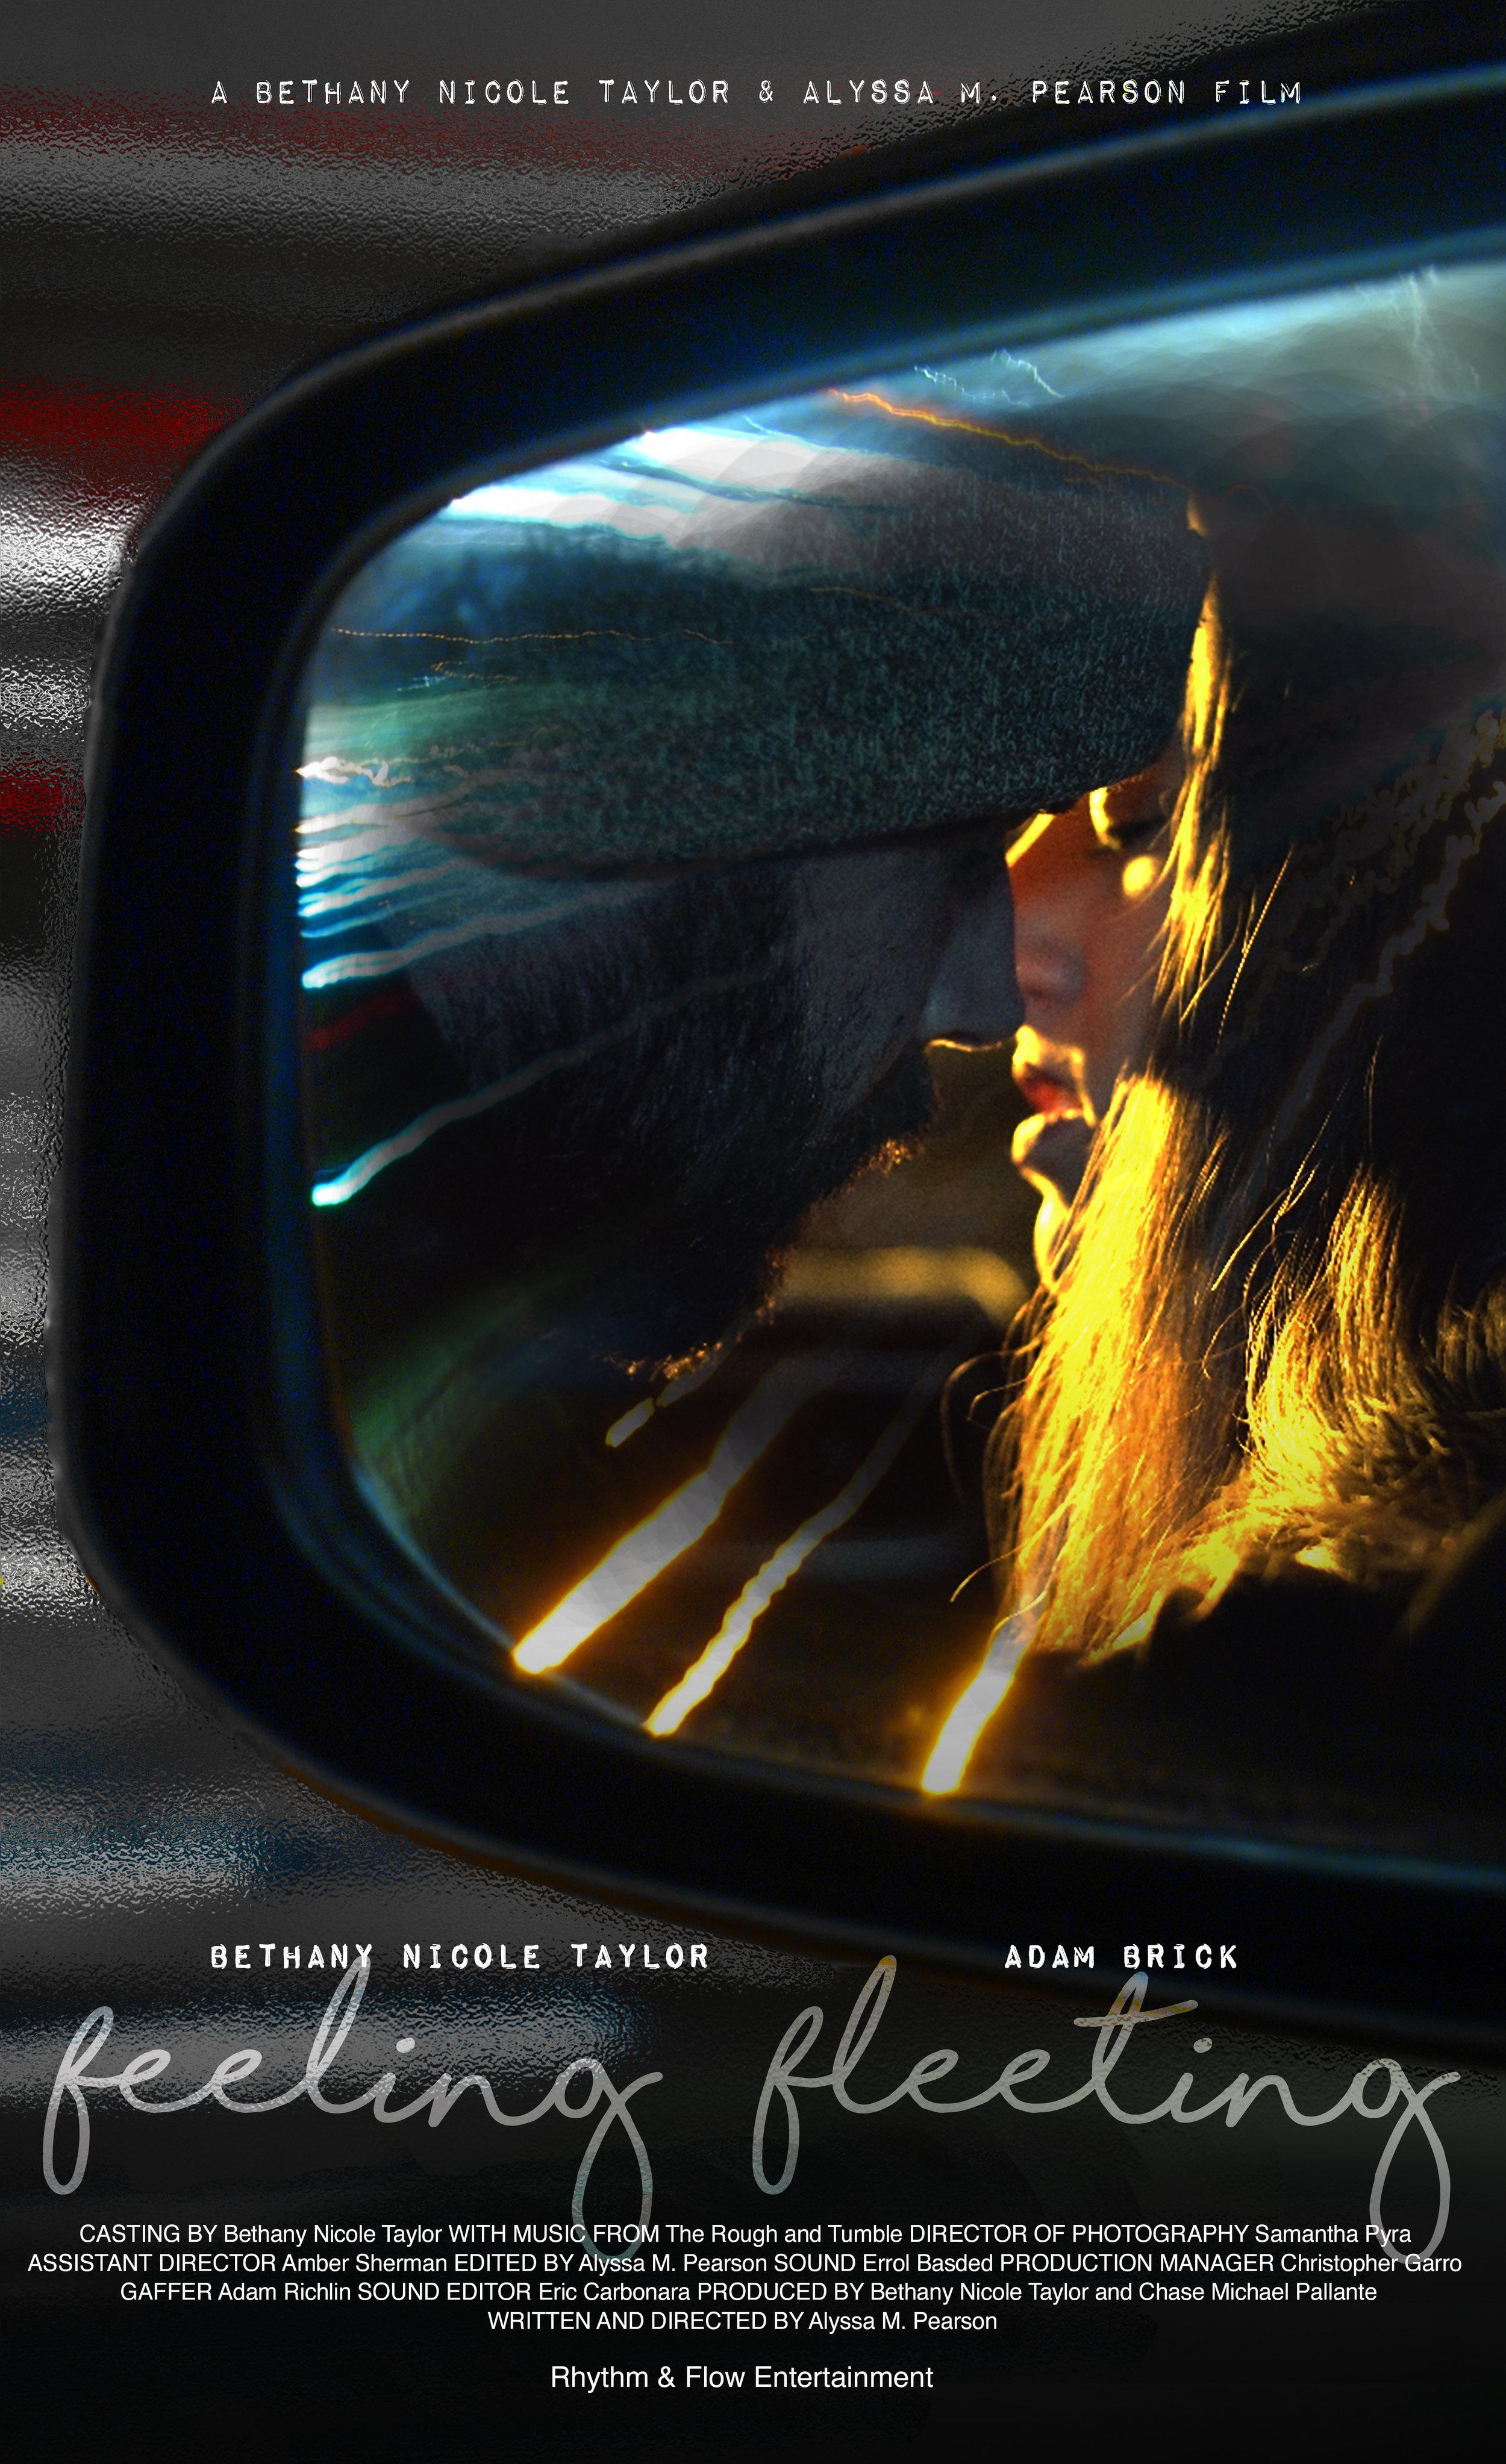 A Bethany Nicole Taylor & Alyssa M. Pearson FILM